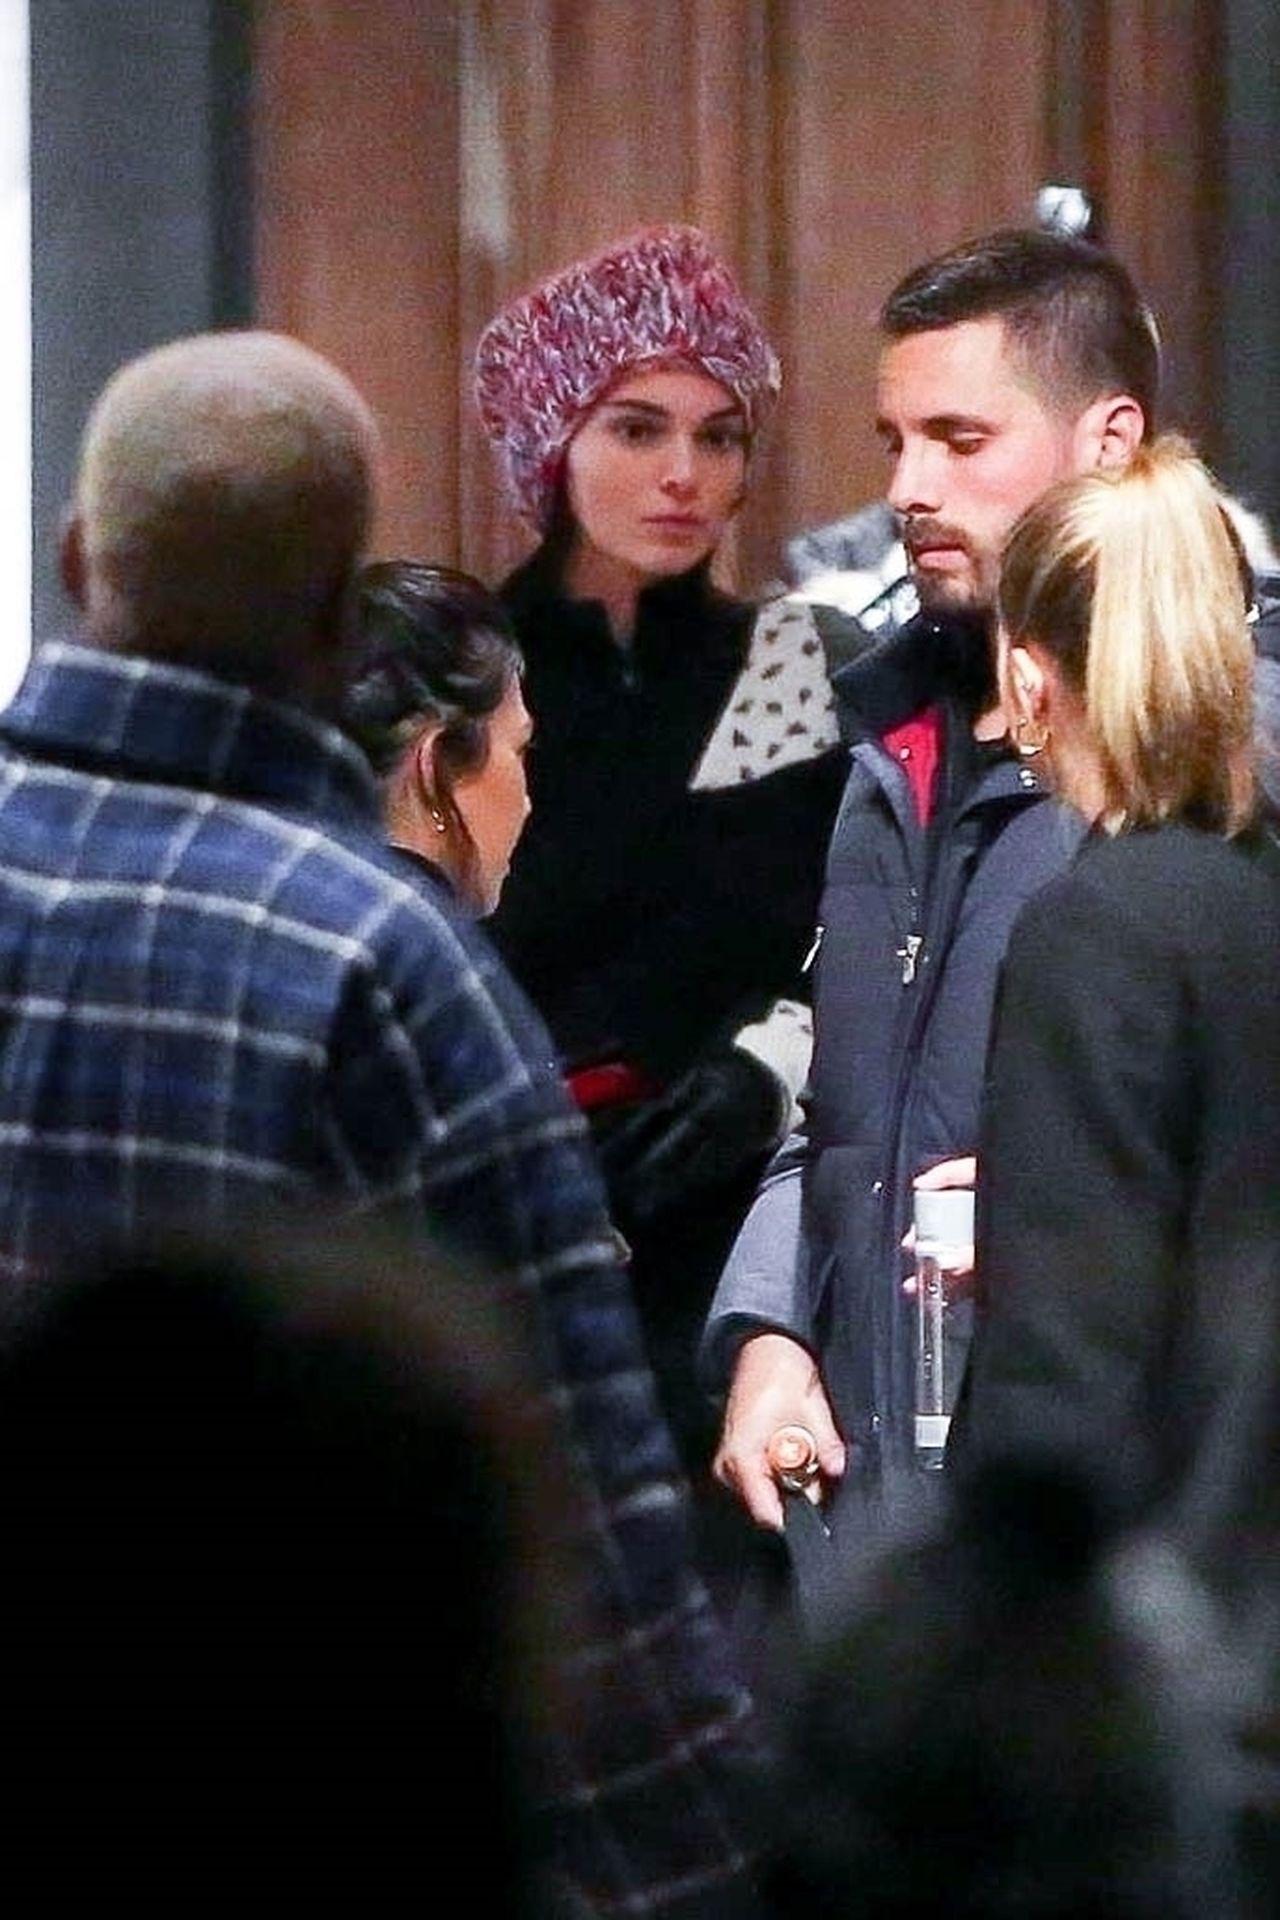 Kardashanki i Jennerki na zakupach w Aspen